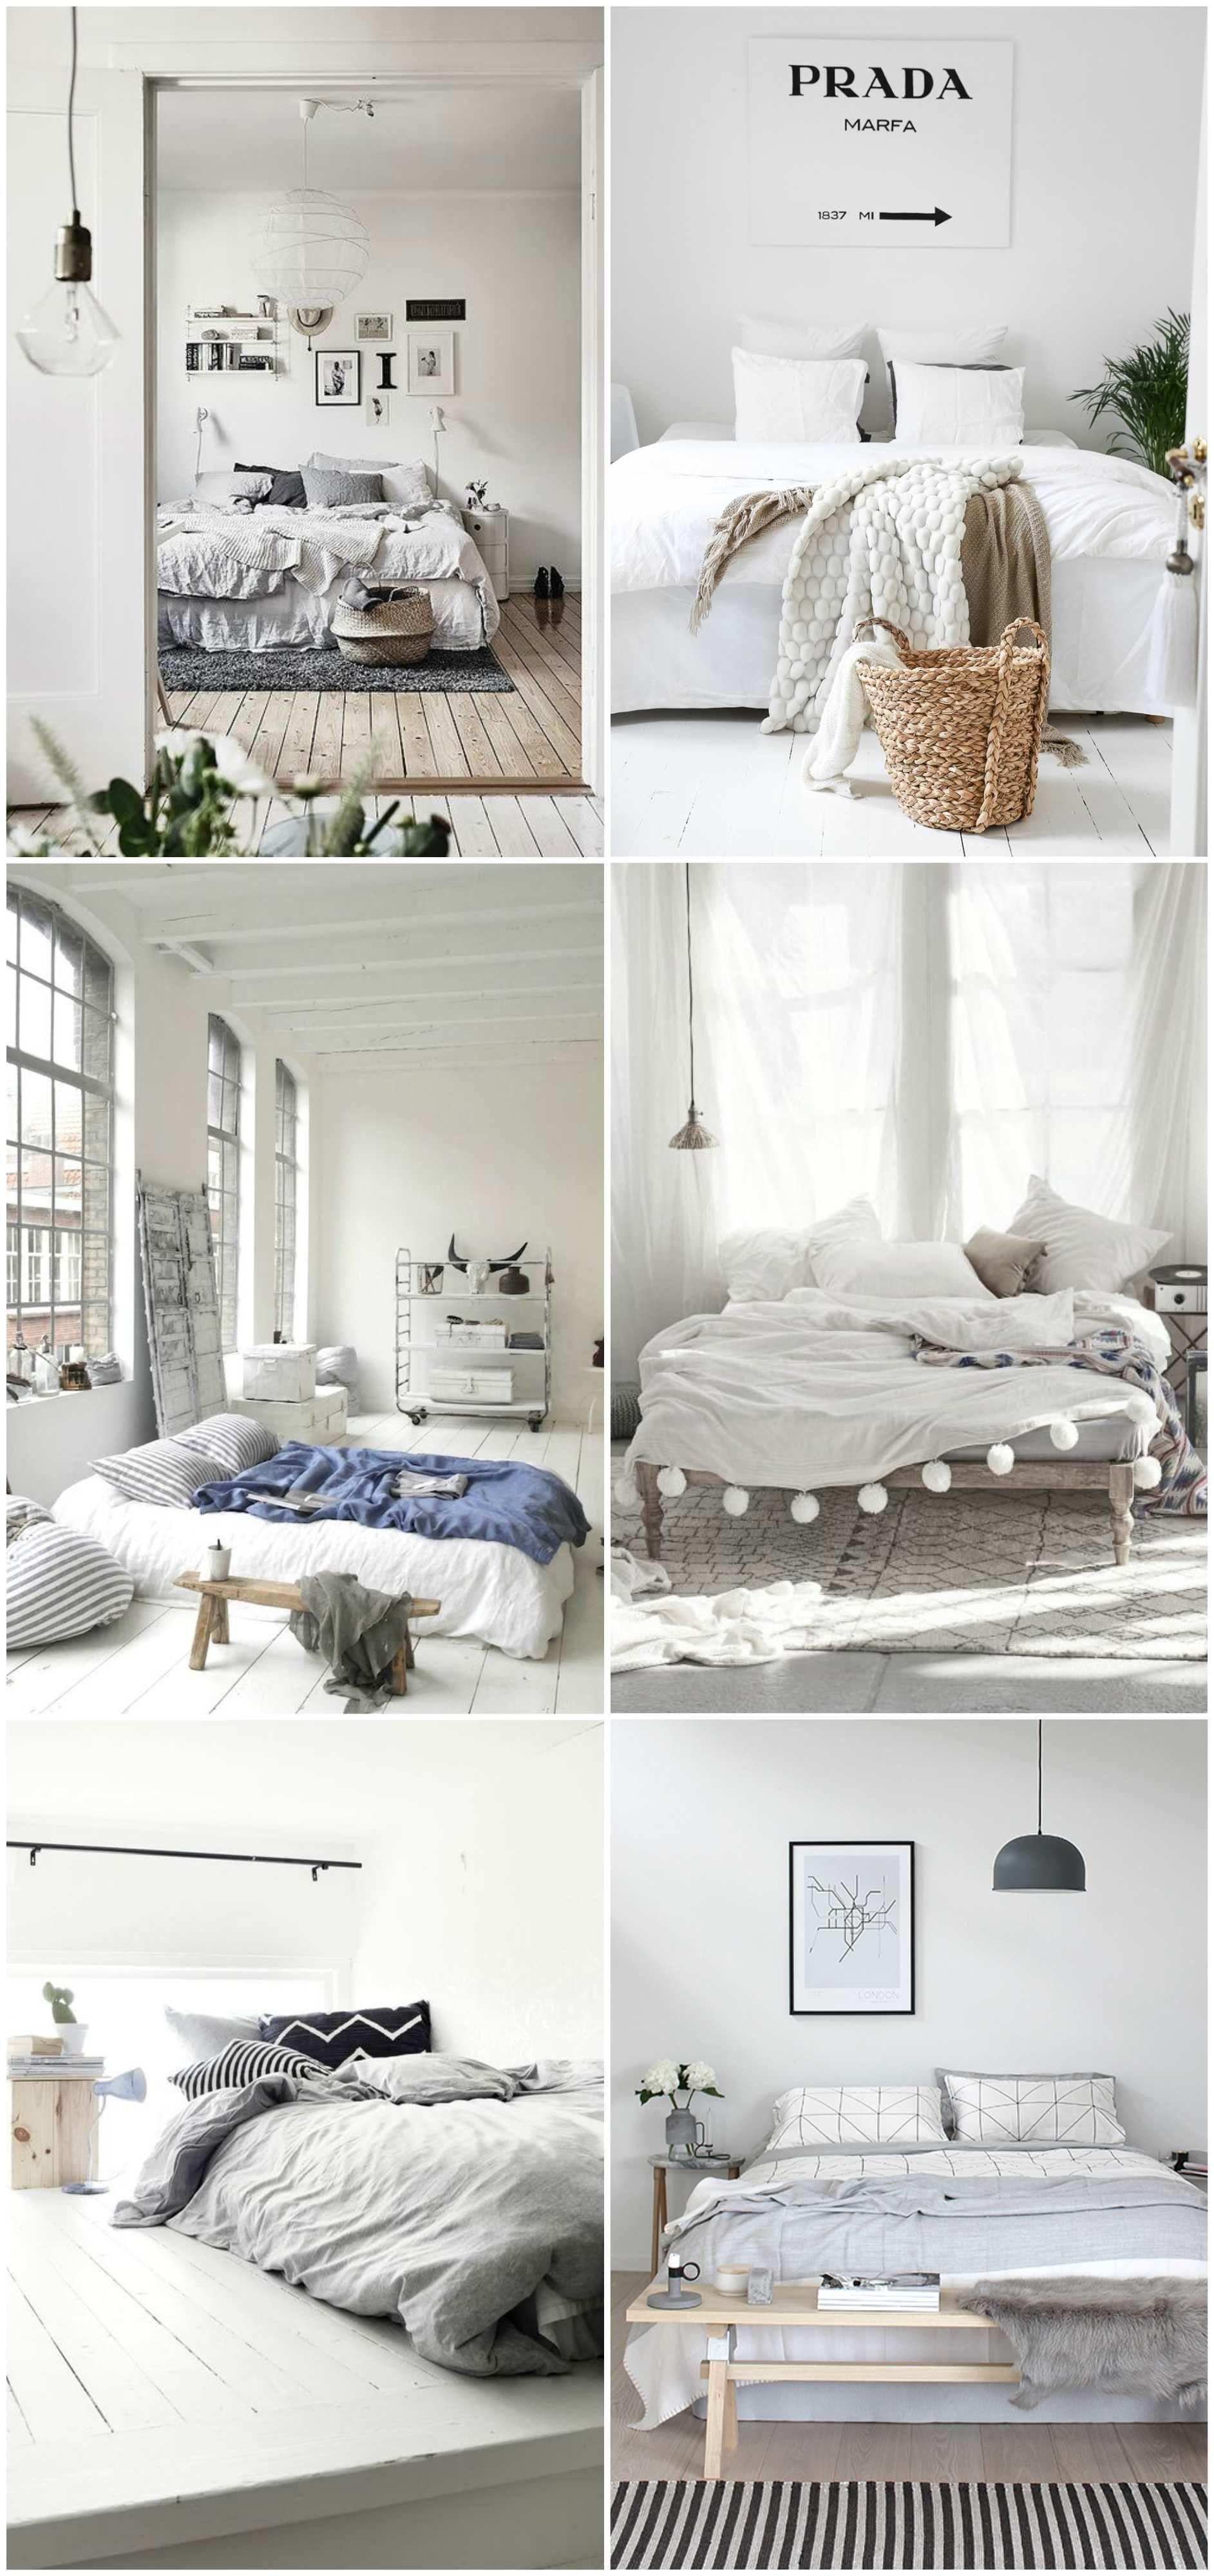 Minimalist bedroom inspiration nordic passion - Interior design ideas for bedroom walls ...